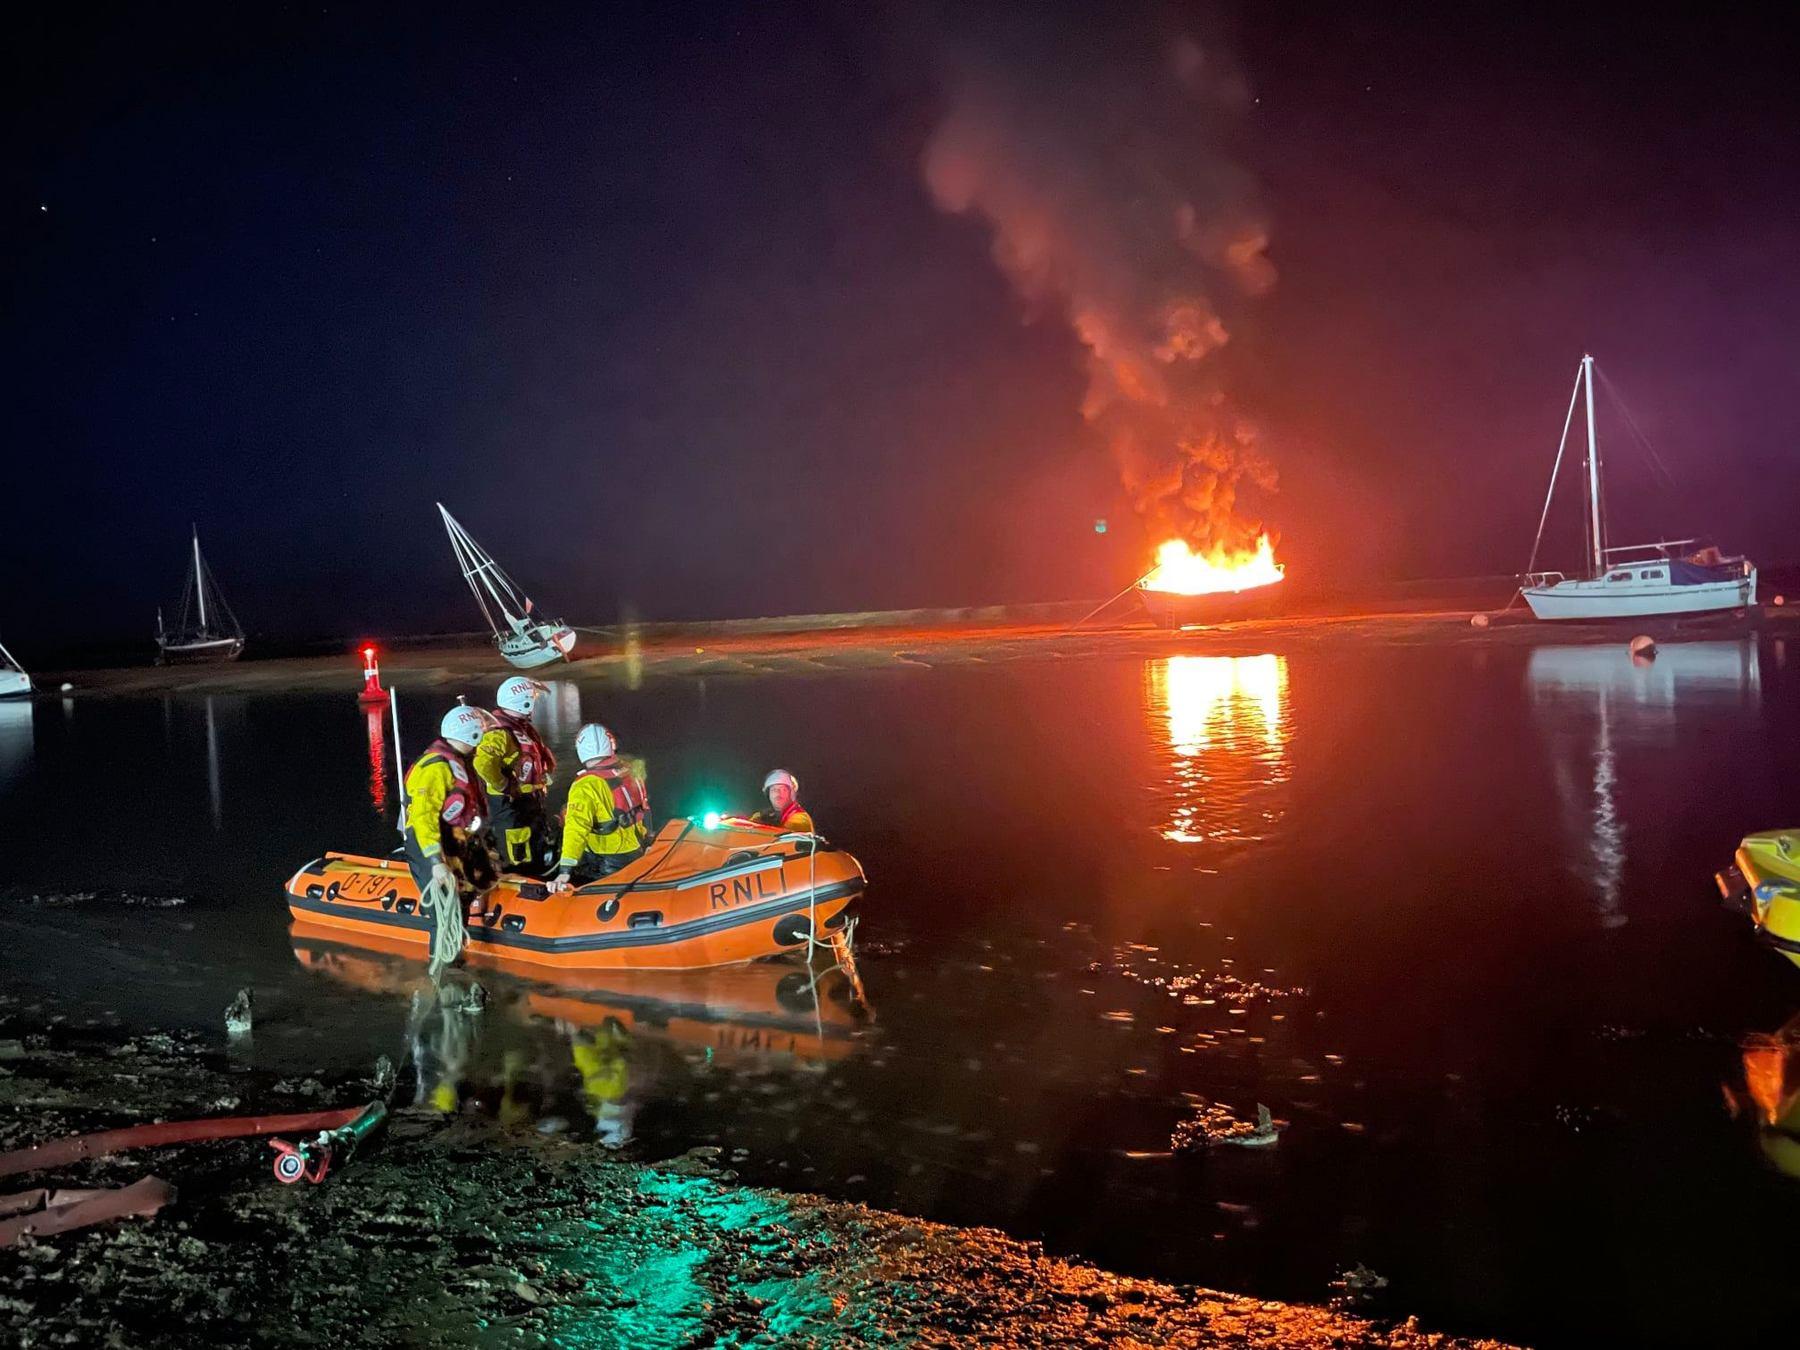 Wells inshore lifeboat attending yacht on fire near Wells quay, 15/10/21